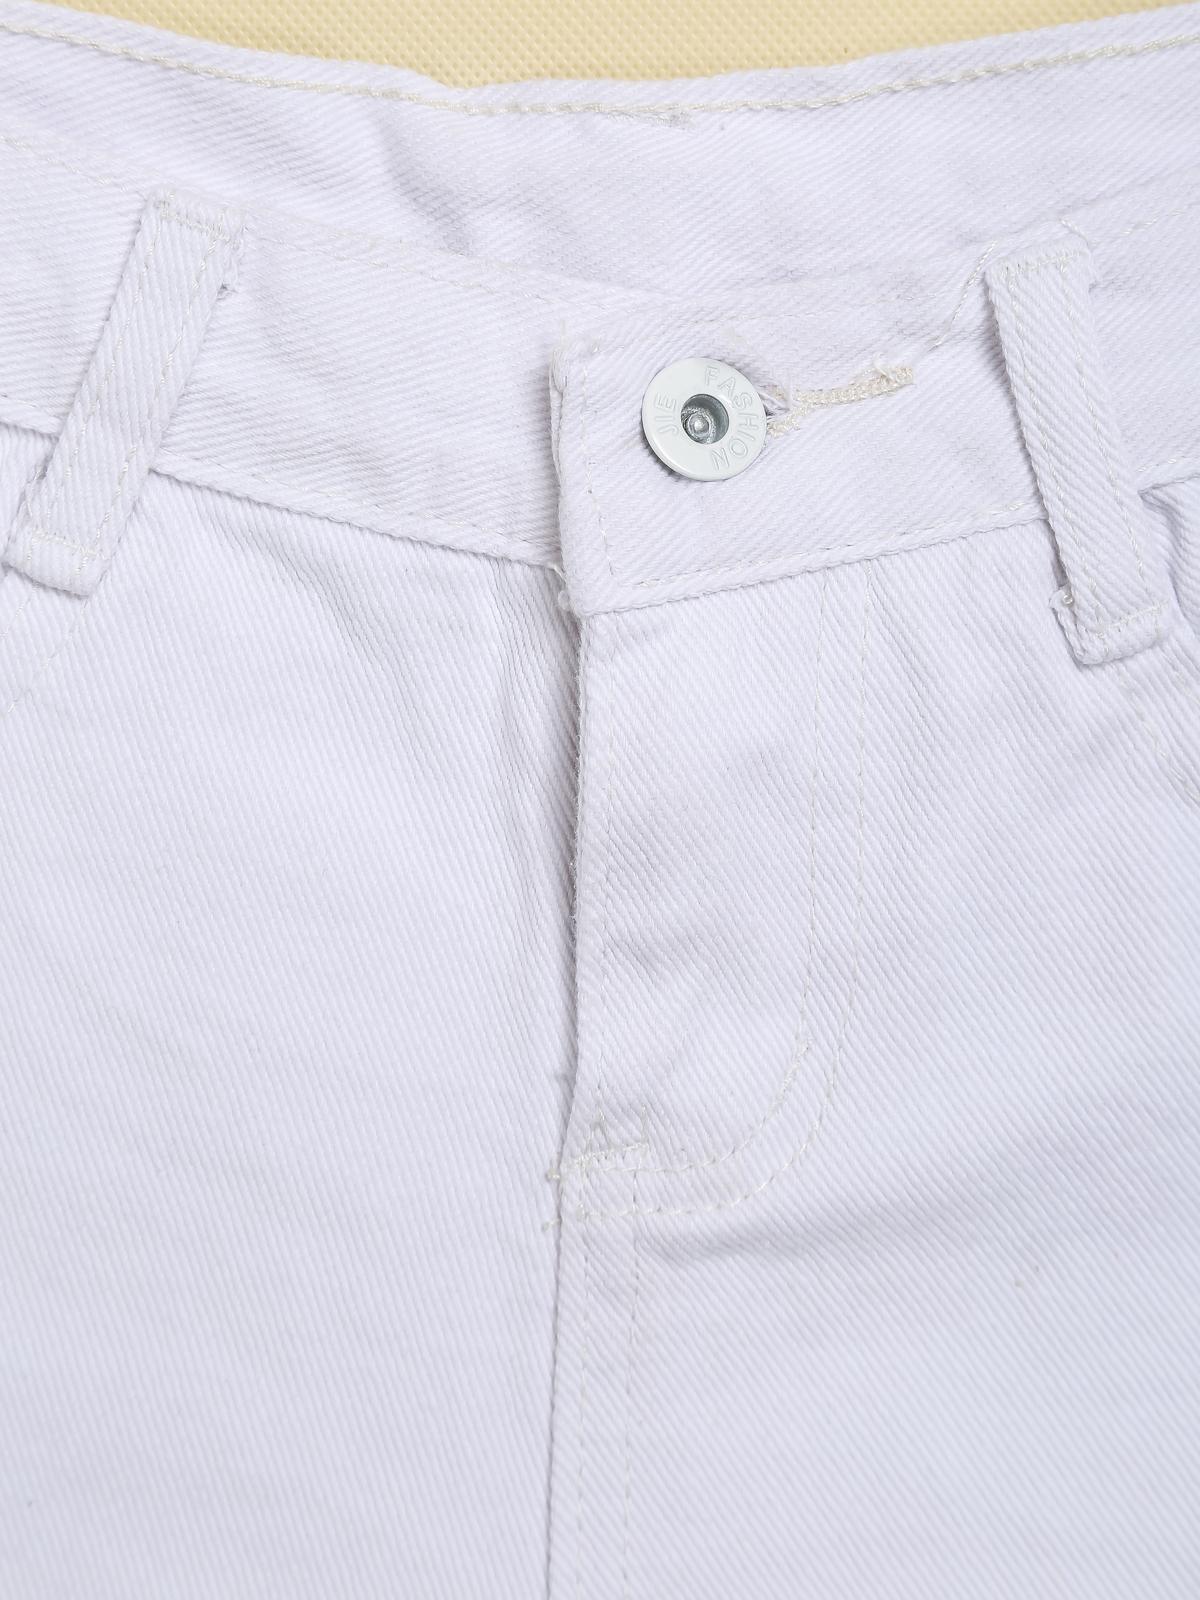 White Ripped Fringe Denim Shorts - Sheinside.com